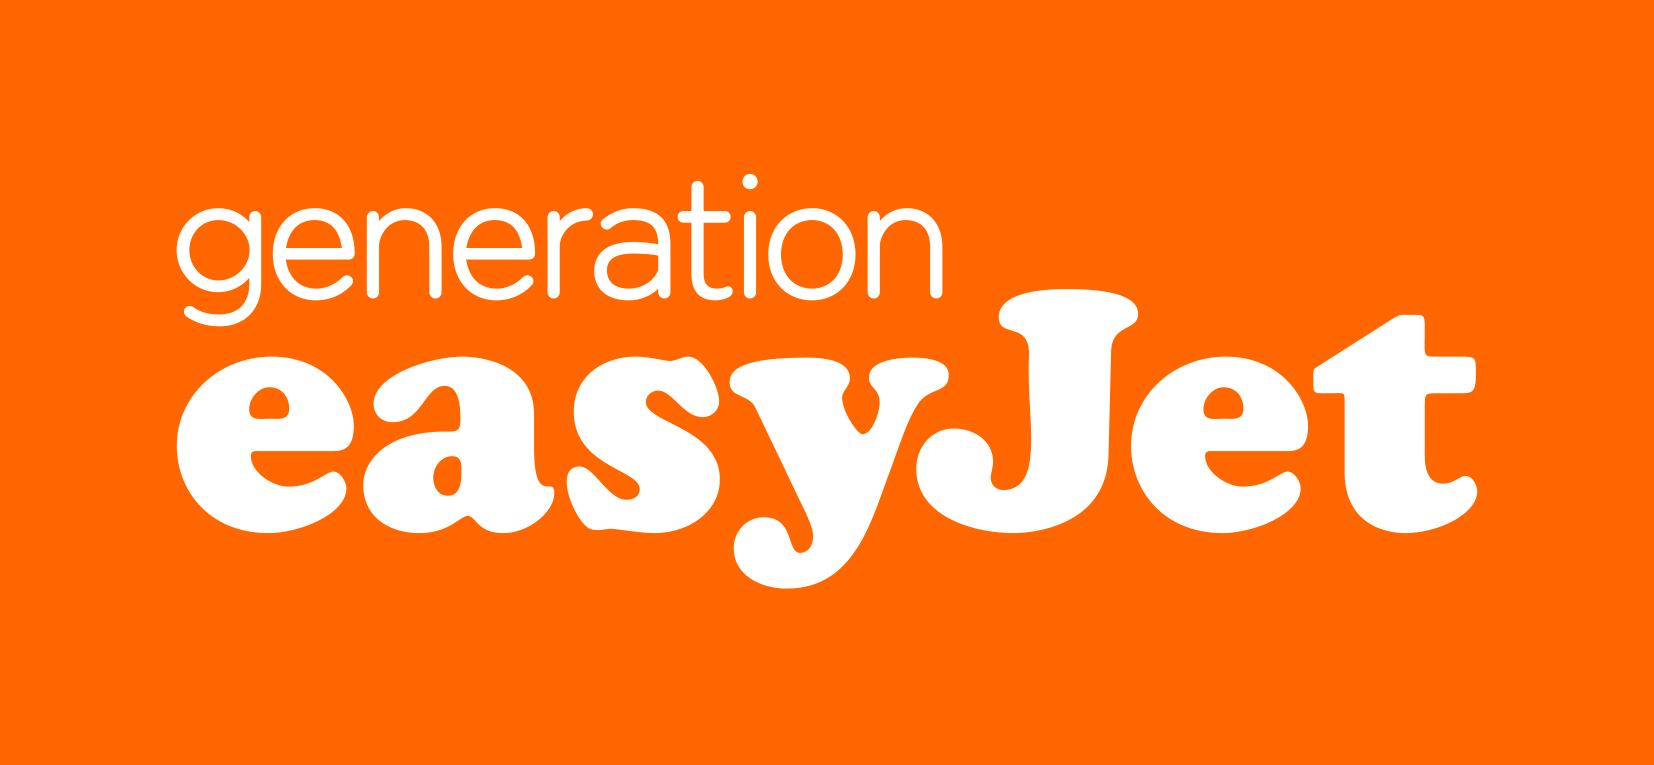 easyJet-generation-orange-RGB PlusPng.com  - Easyjet PNG